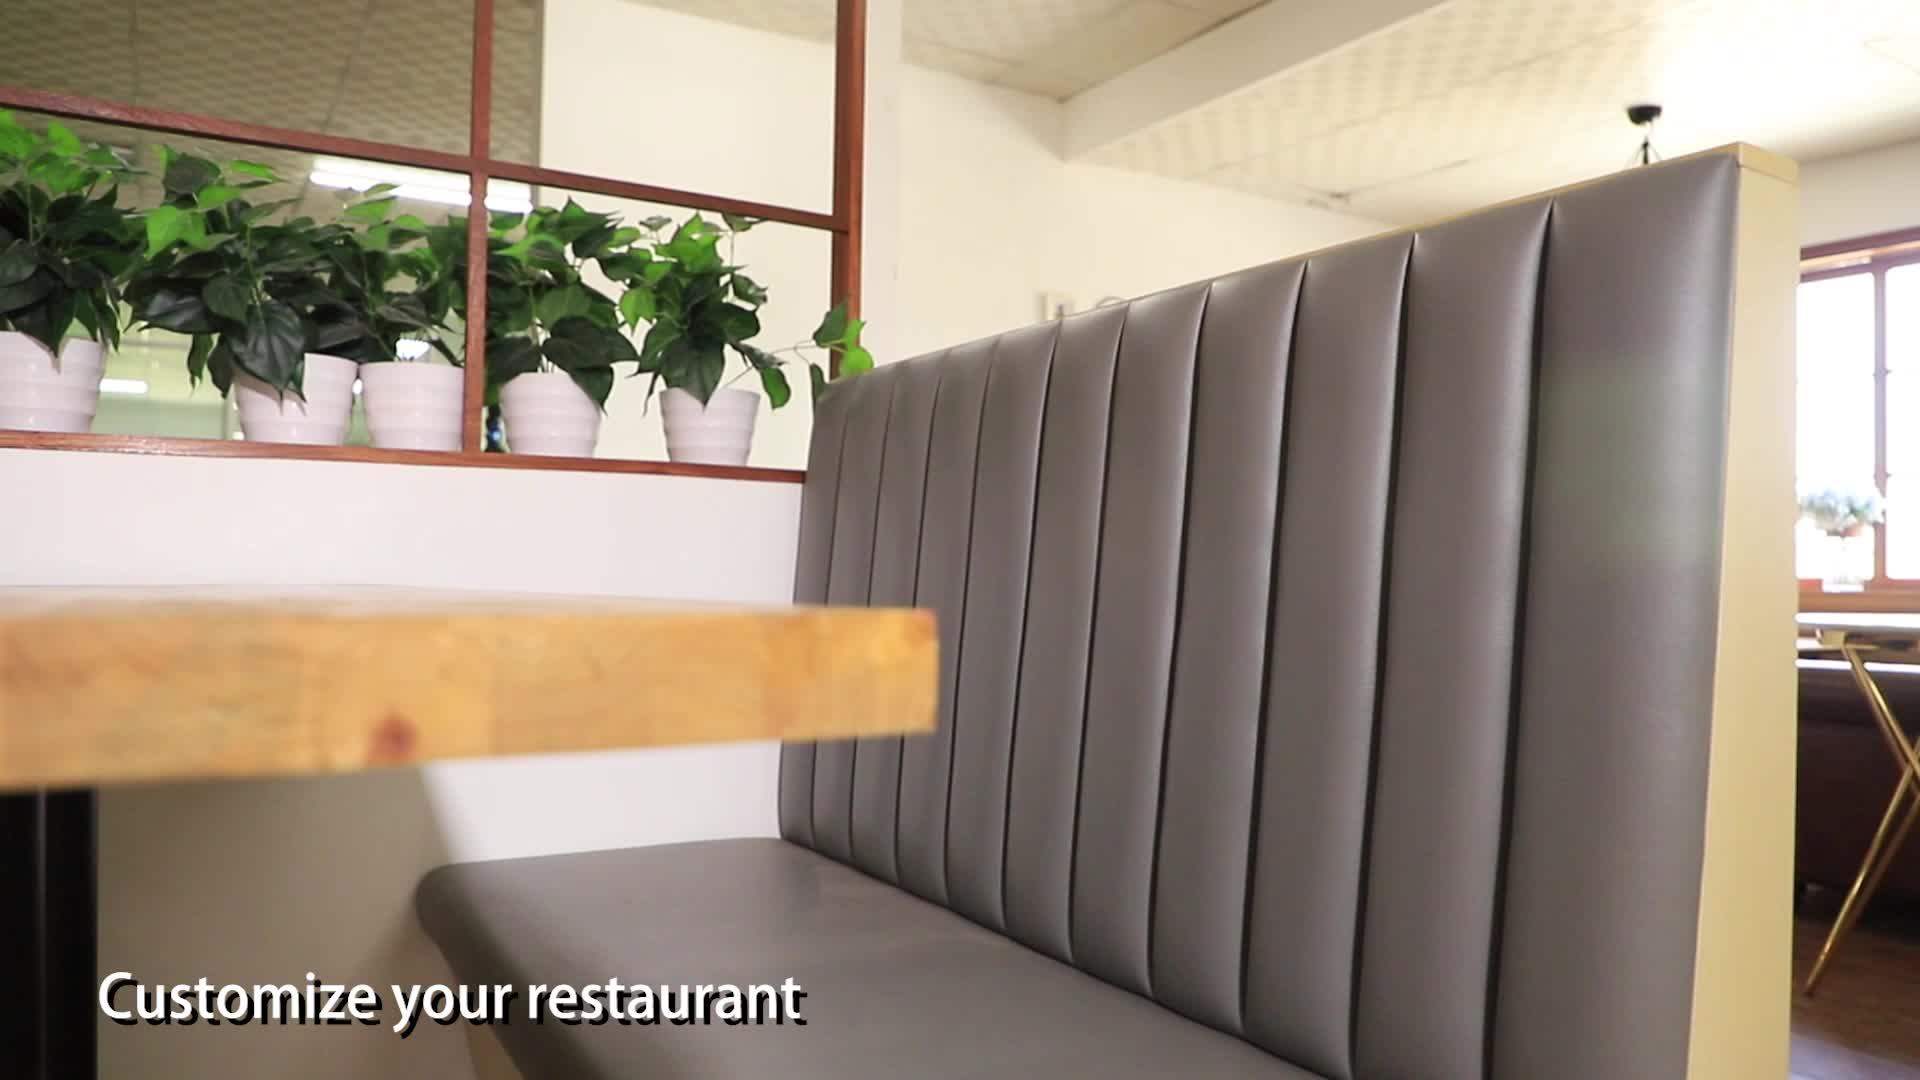 Özel mermer masa şık açık lüks masa ve sandalyeler sağlam ahşap kanepe